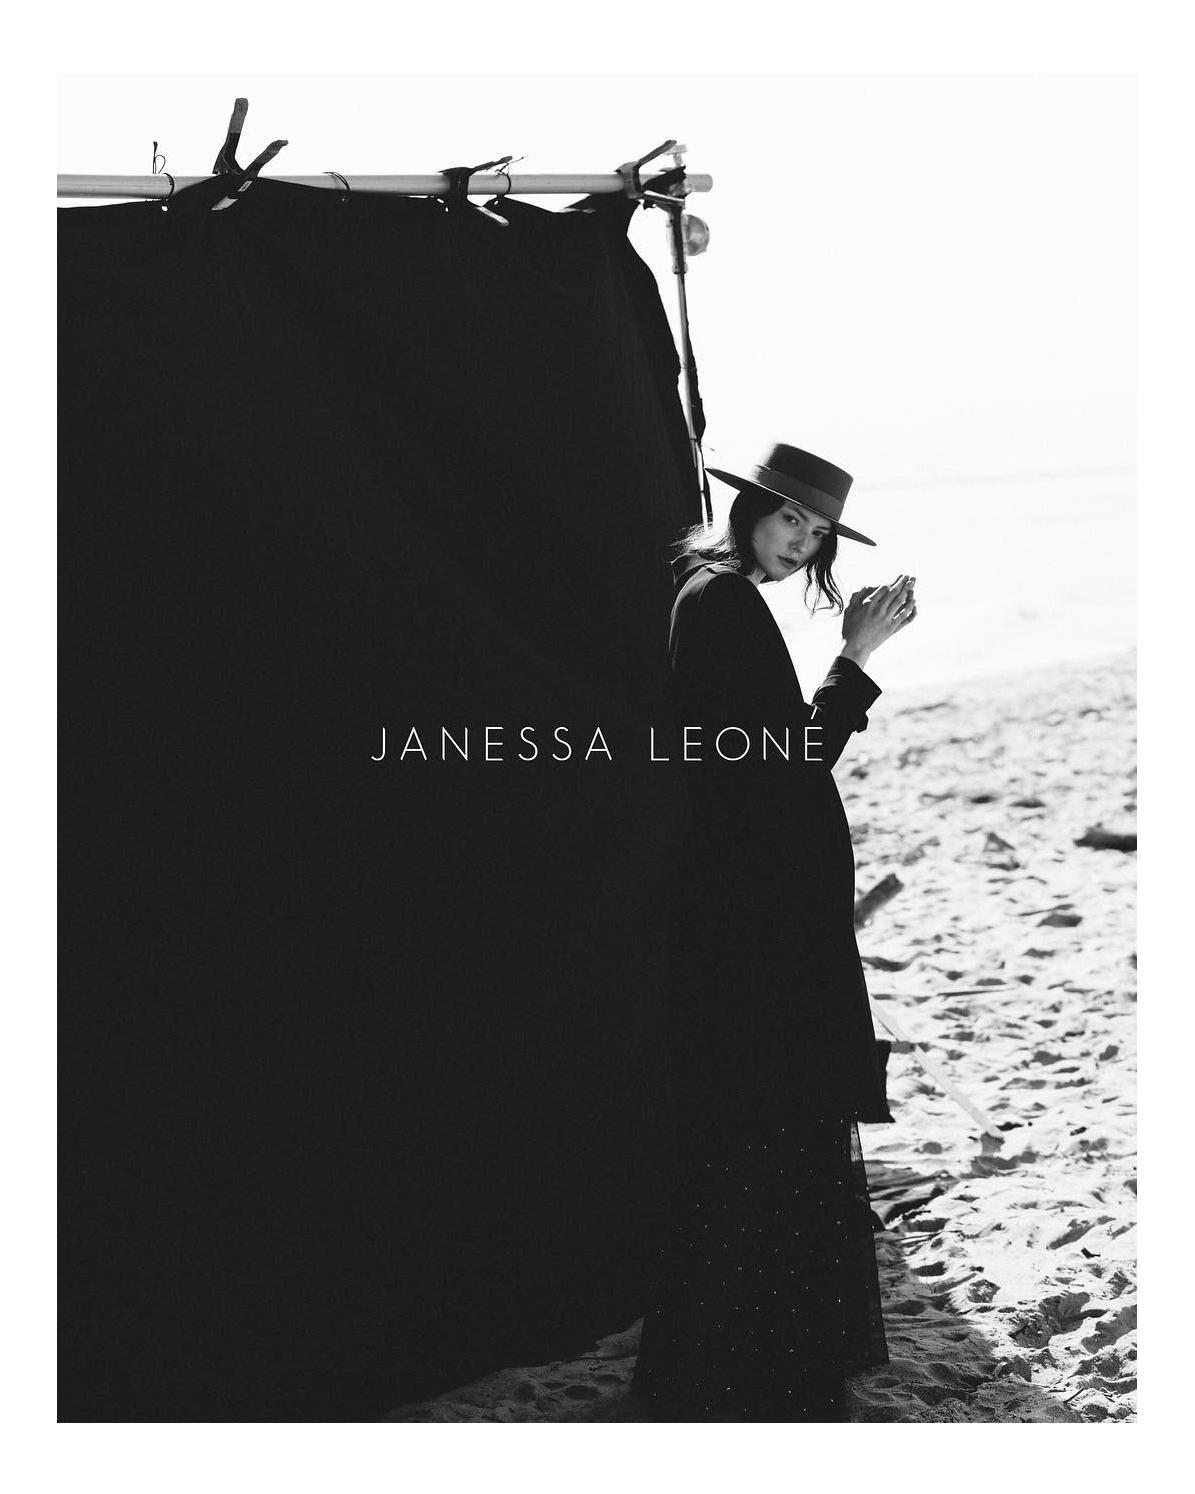 JANESSA LEONÉ